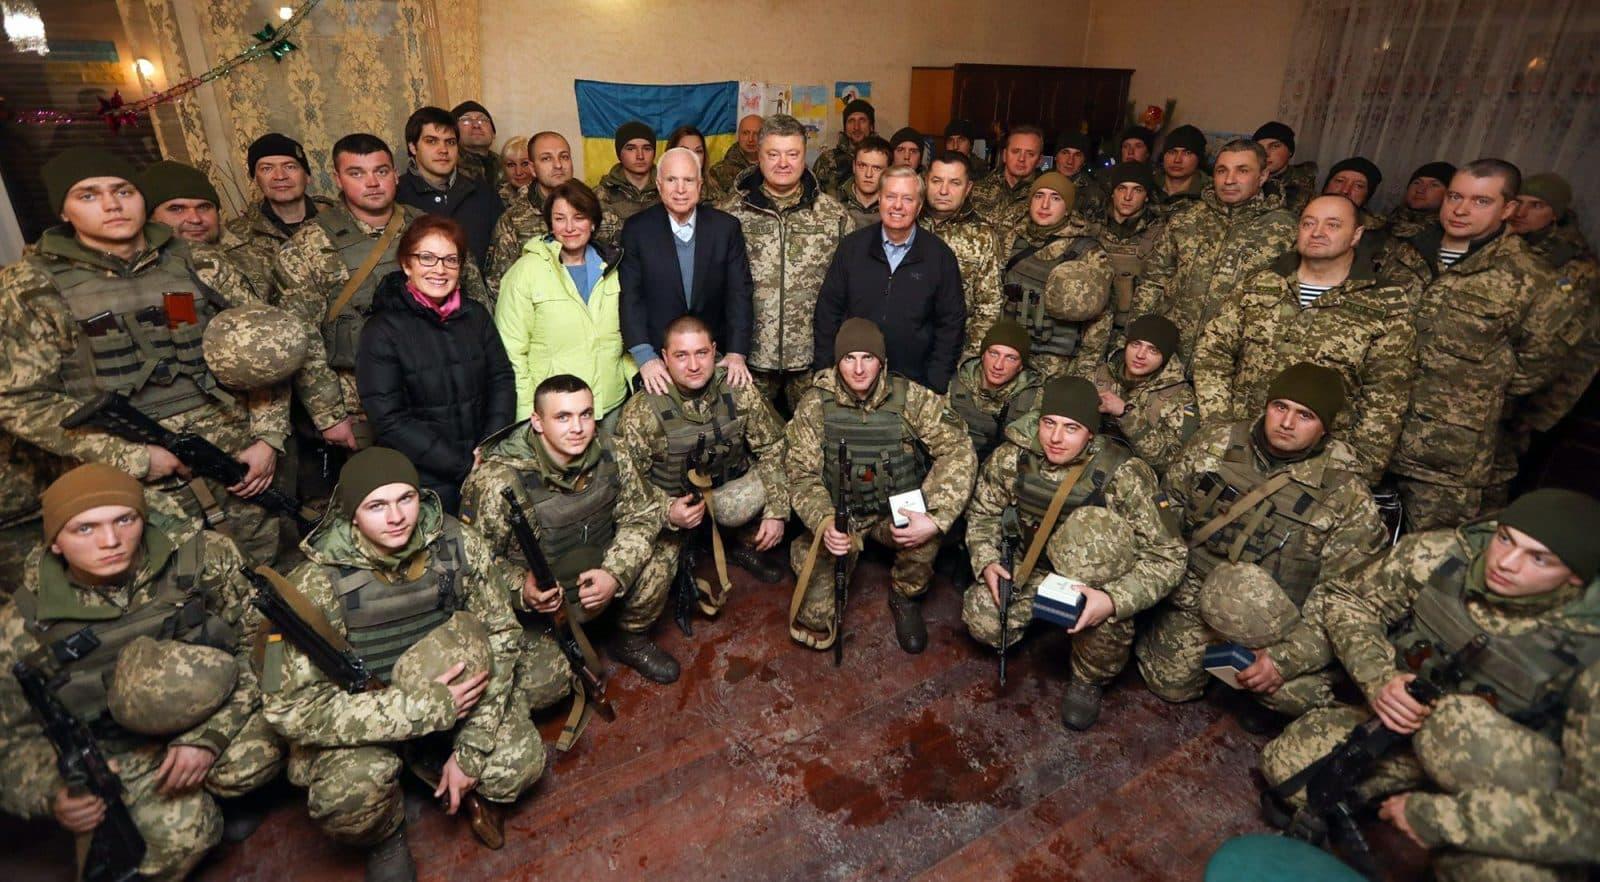 John McCain, Lindsey Graham and Amy Klobuchar in Donbas